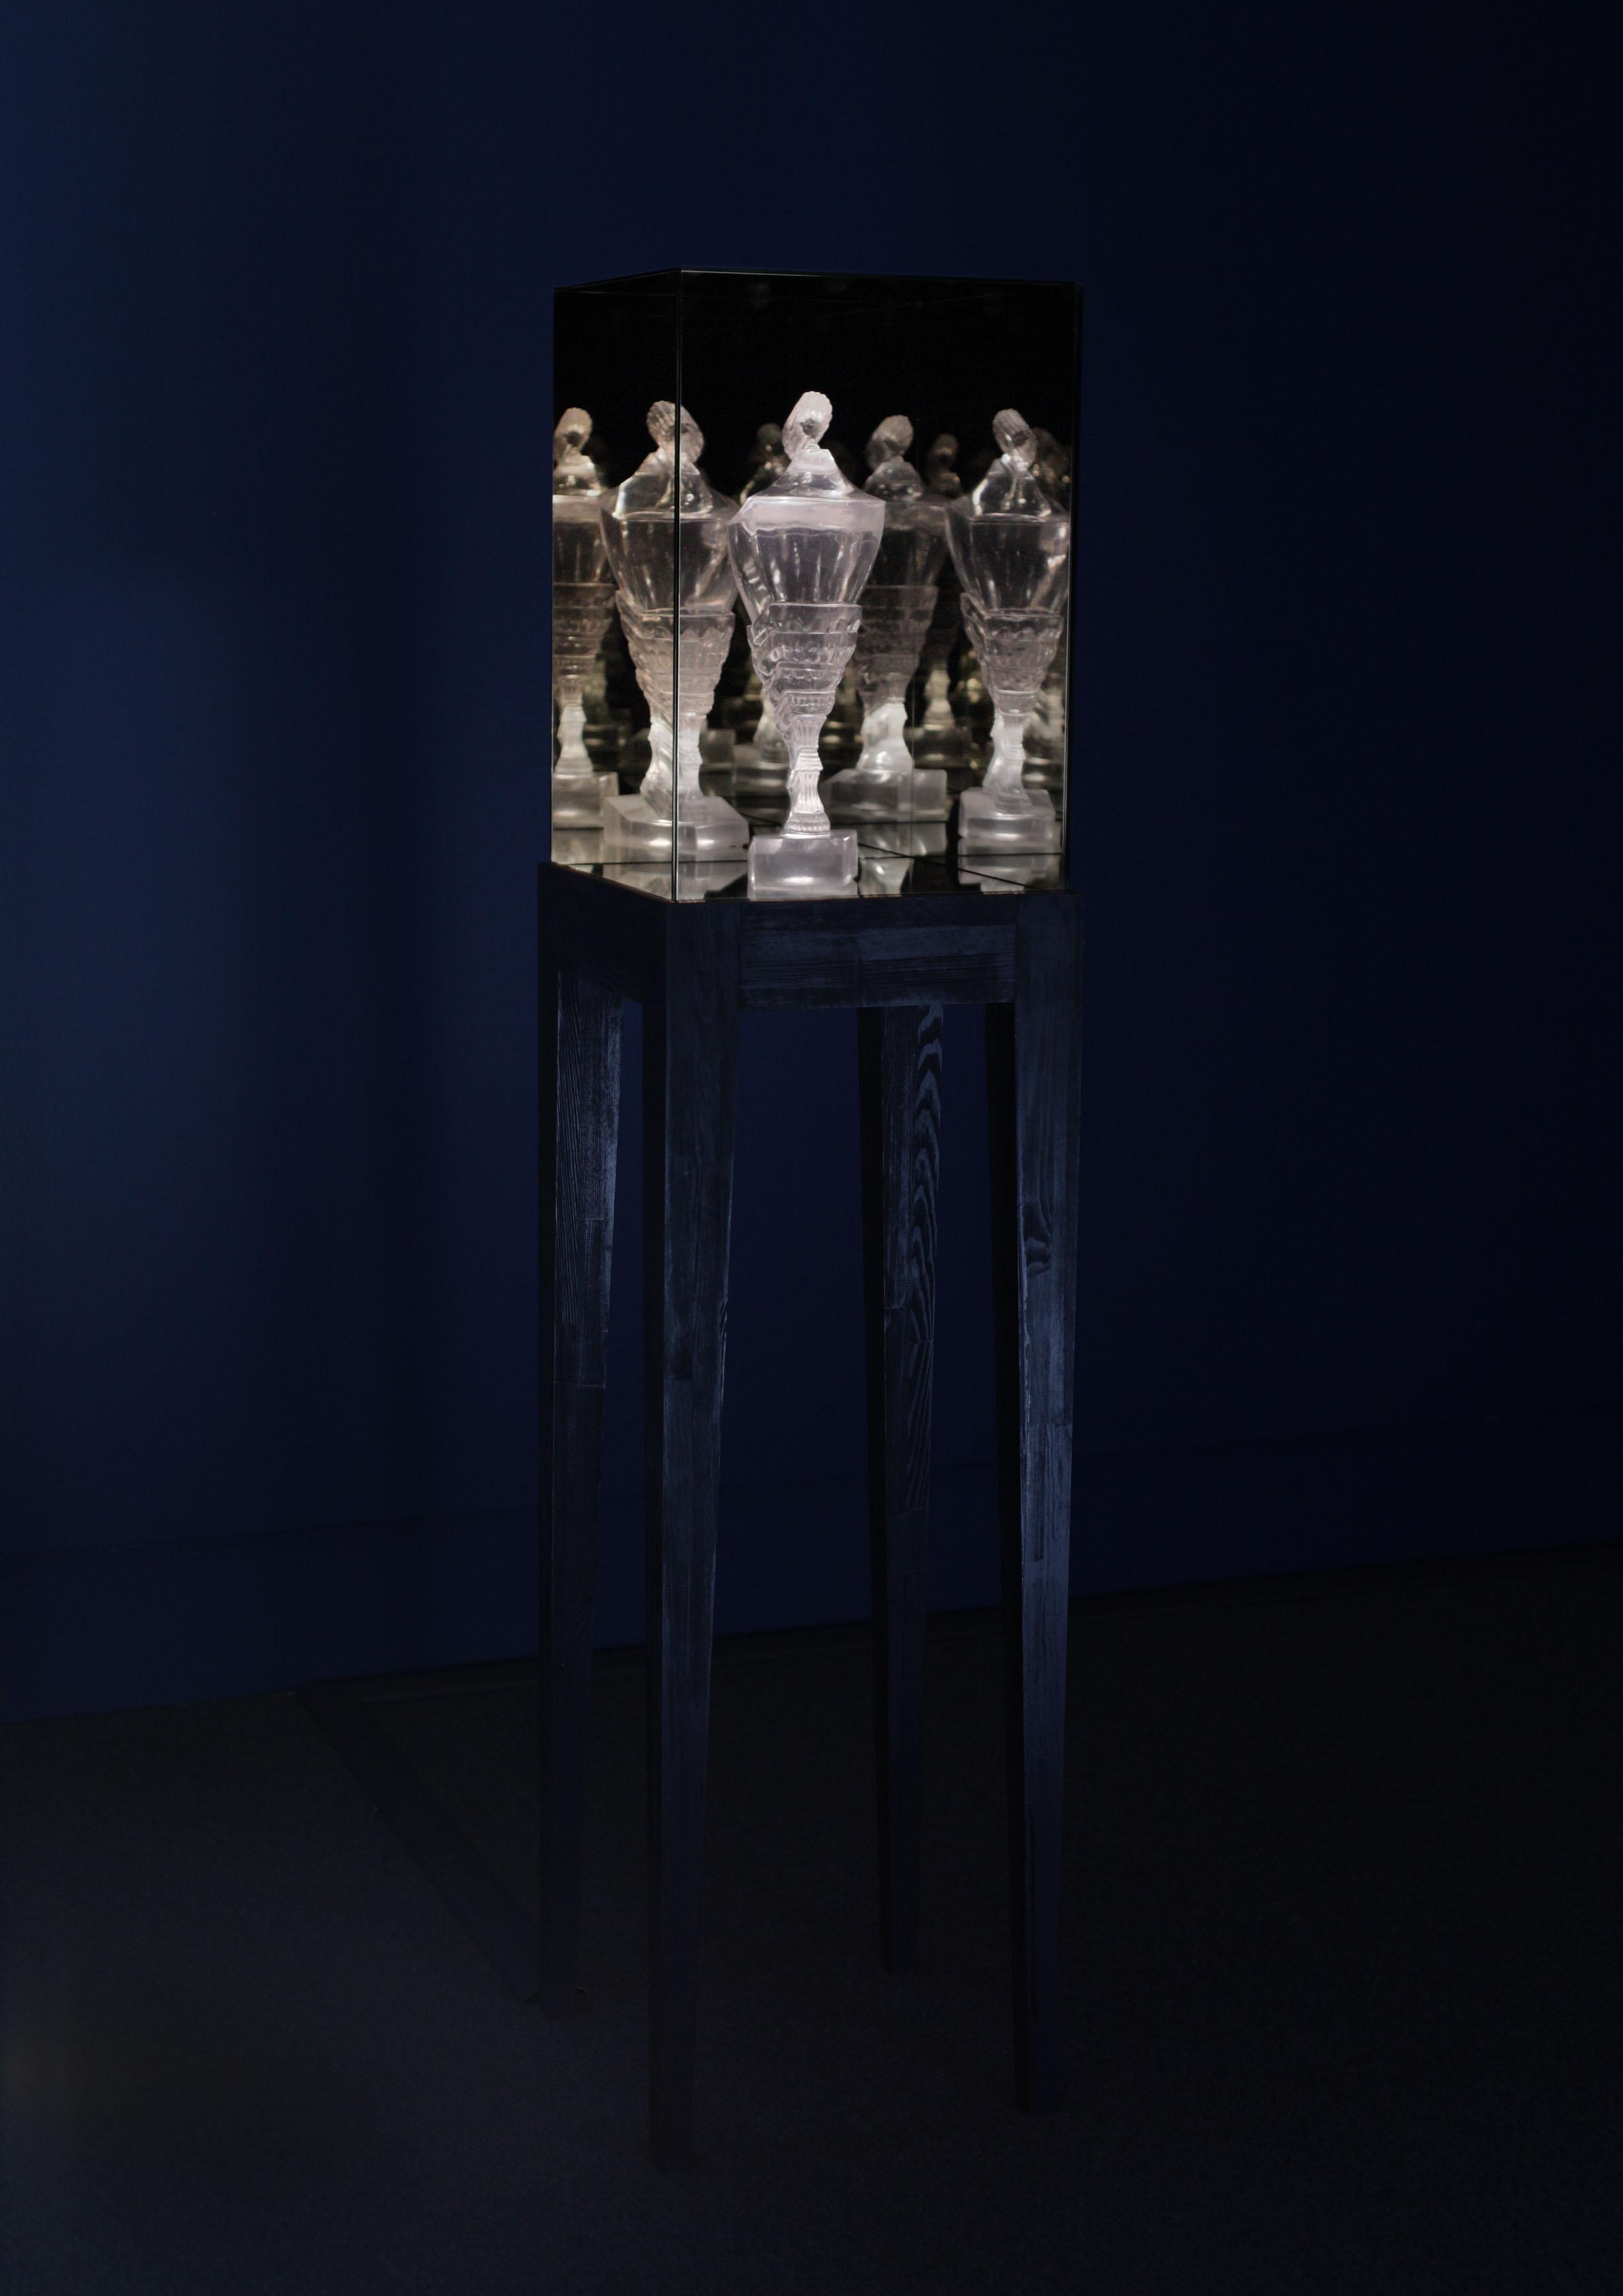 Doku-ALICE-Pokal-Hauptbild.jpg